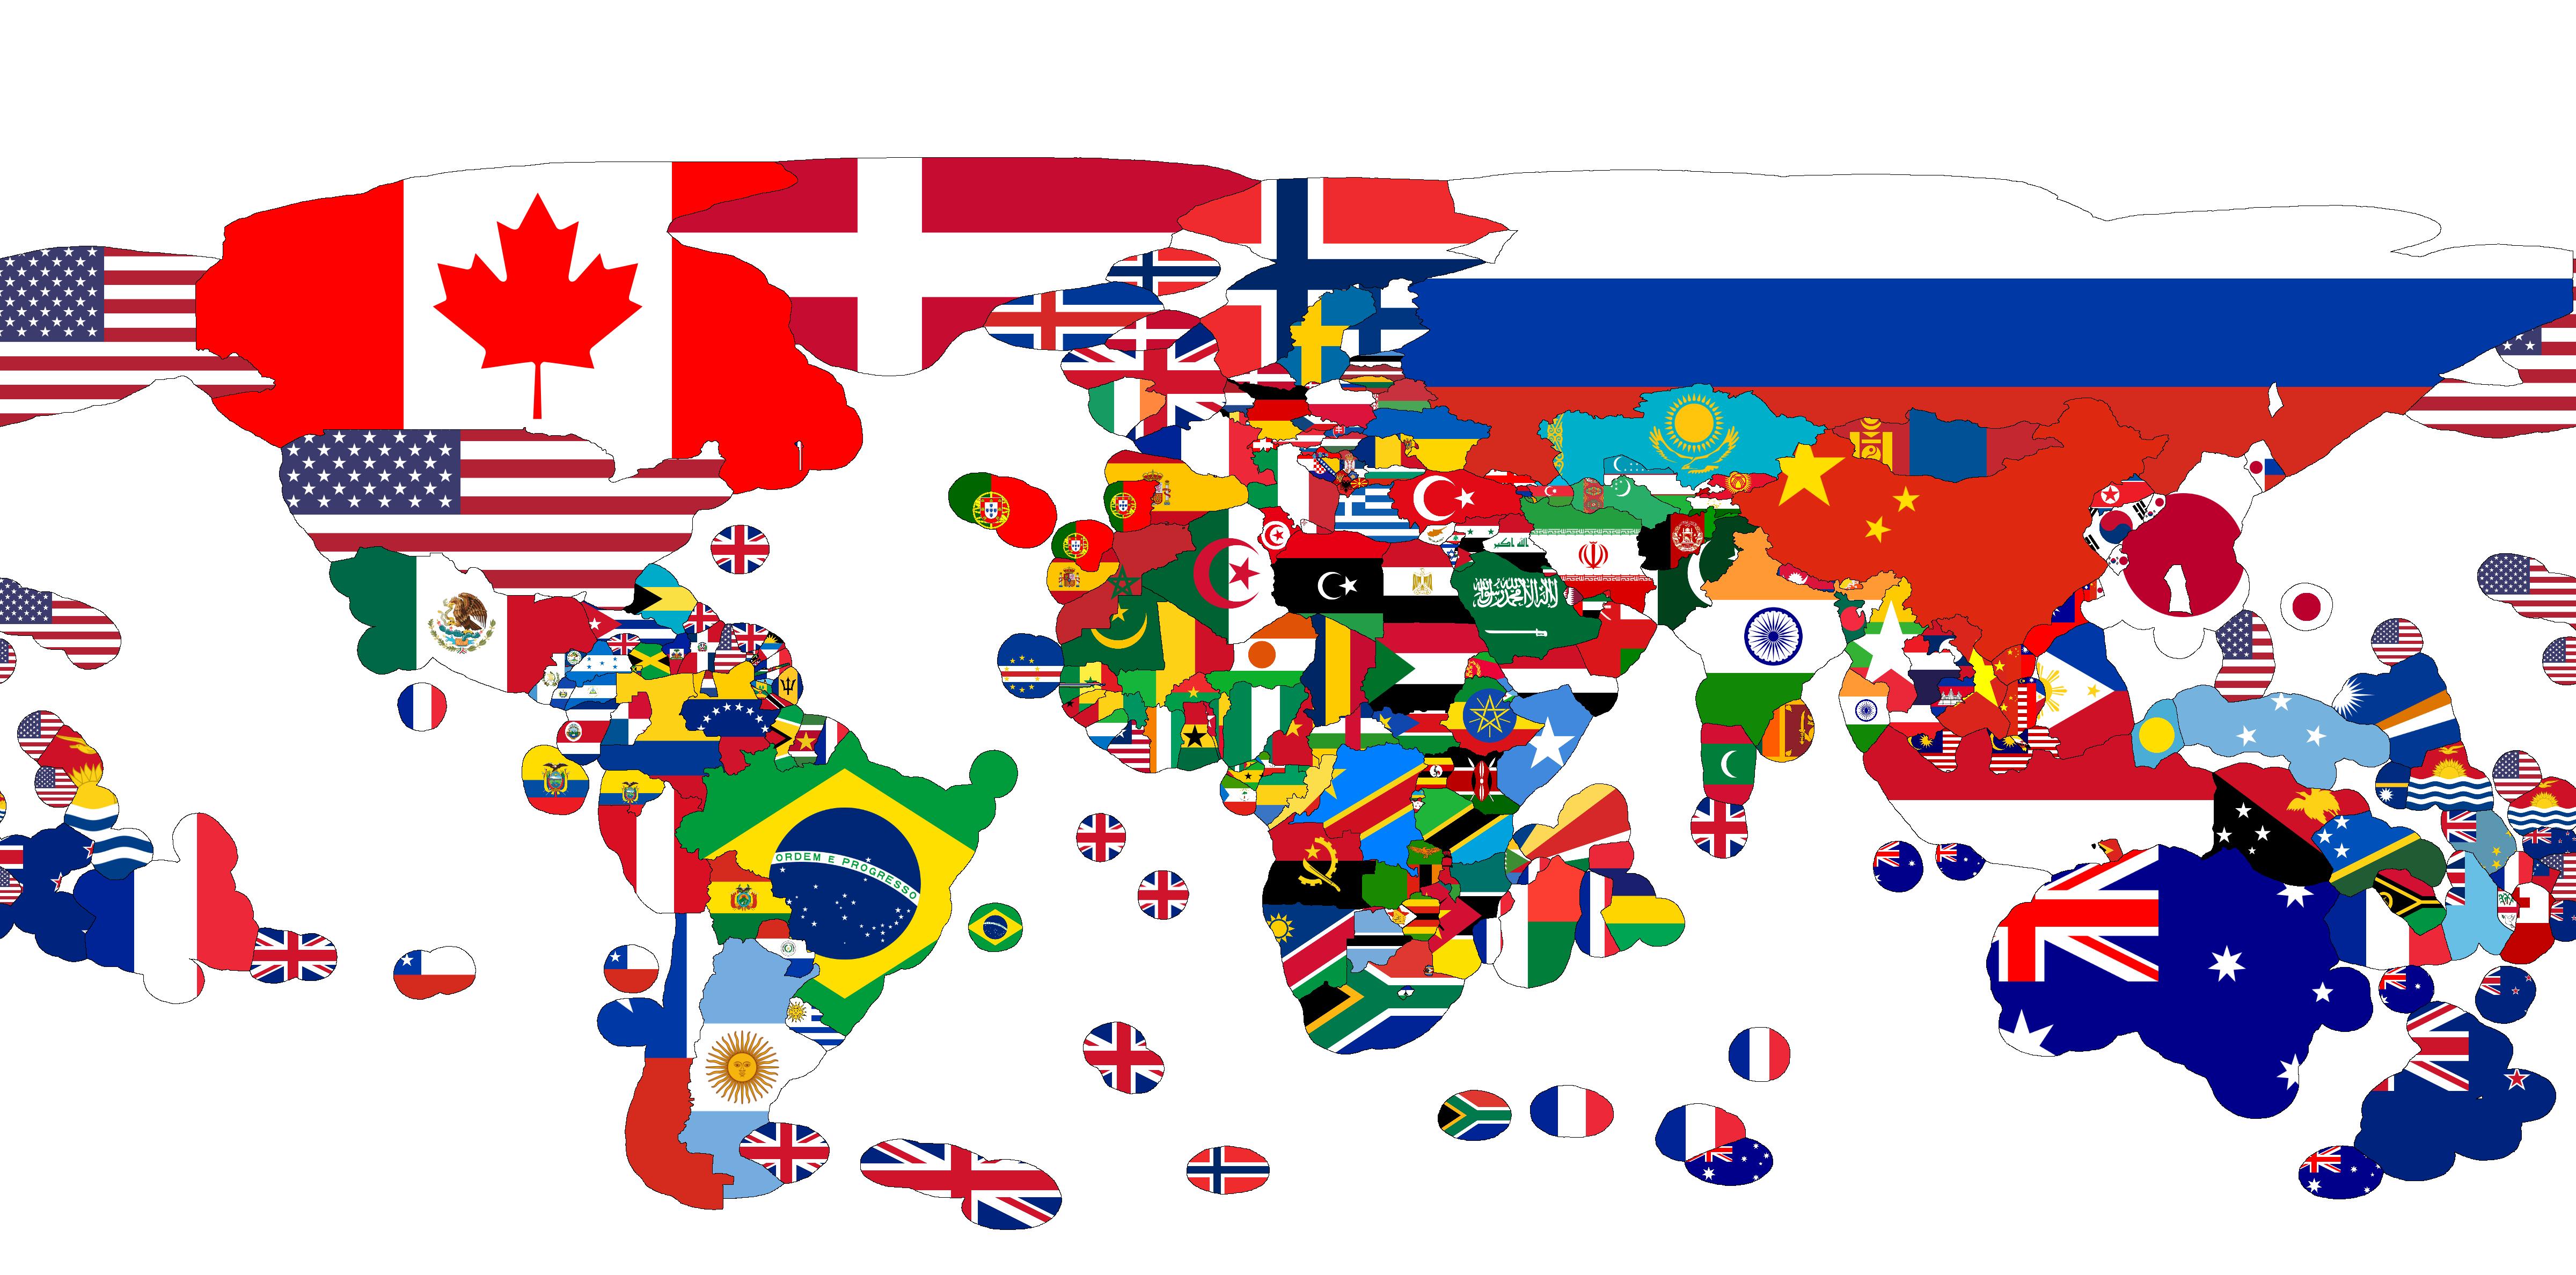 Exclusive economic zone clipart svg Territorial Waters & Exclusive Economic Zones (EEZ) Of The World ... svg